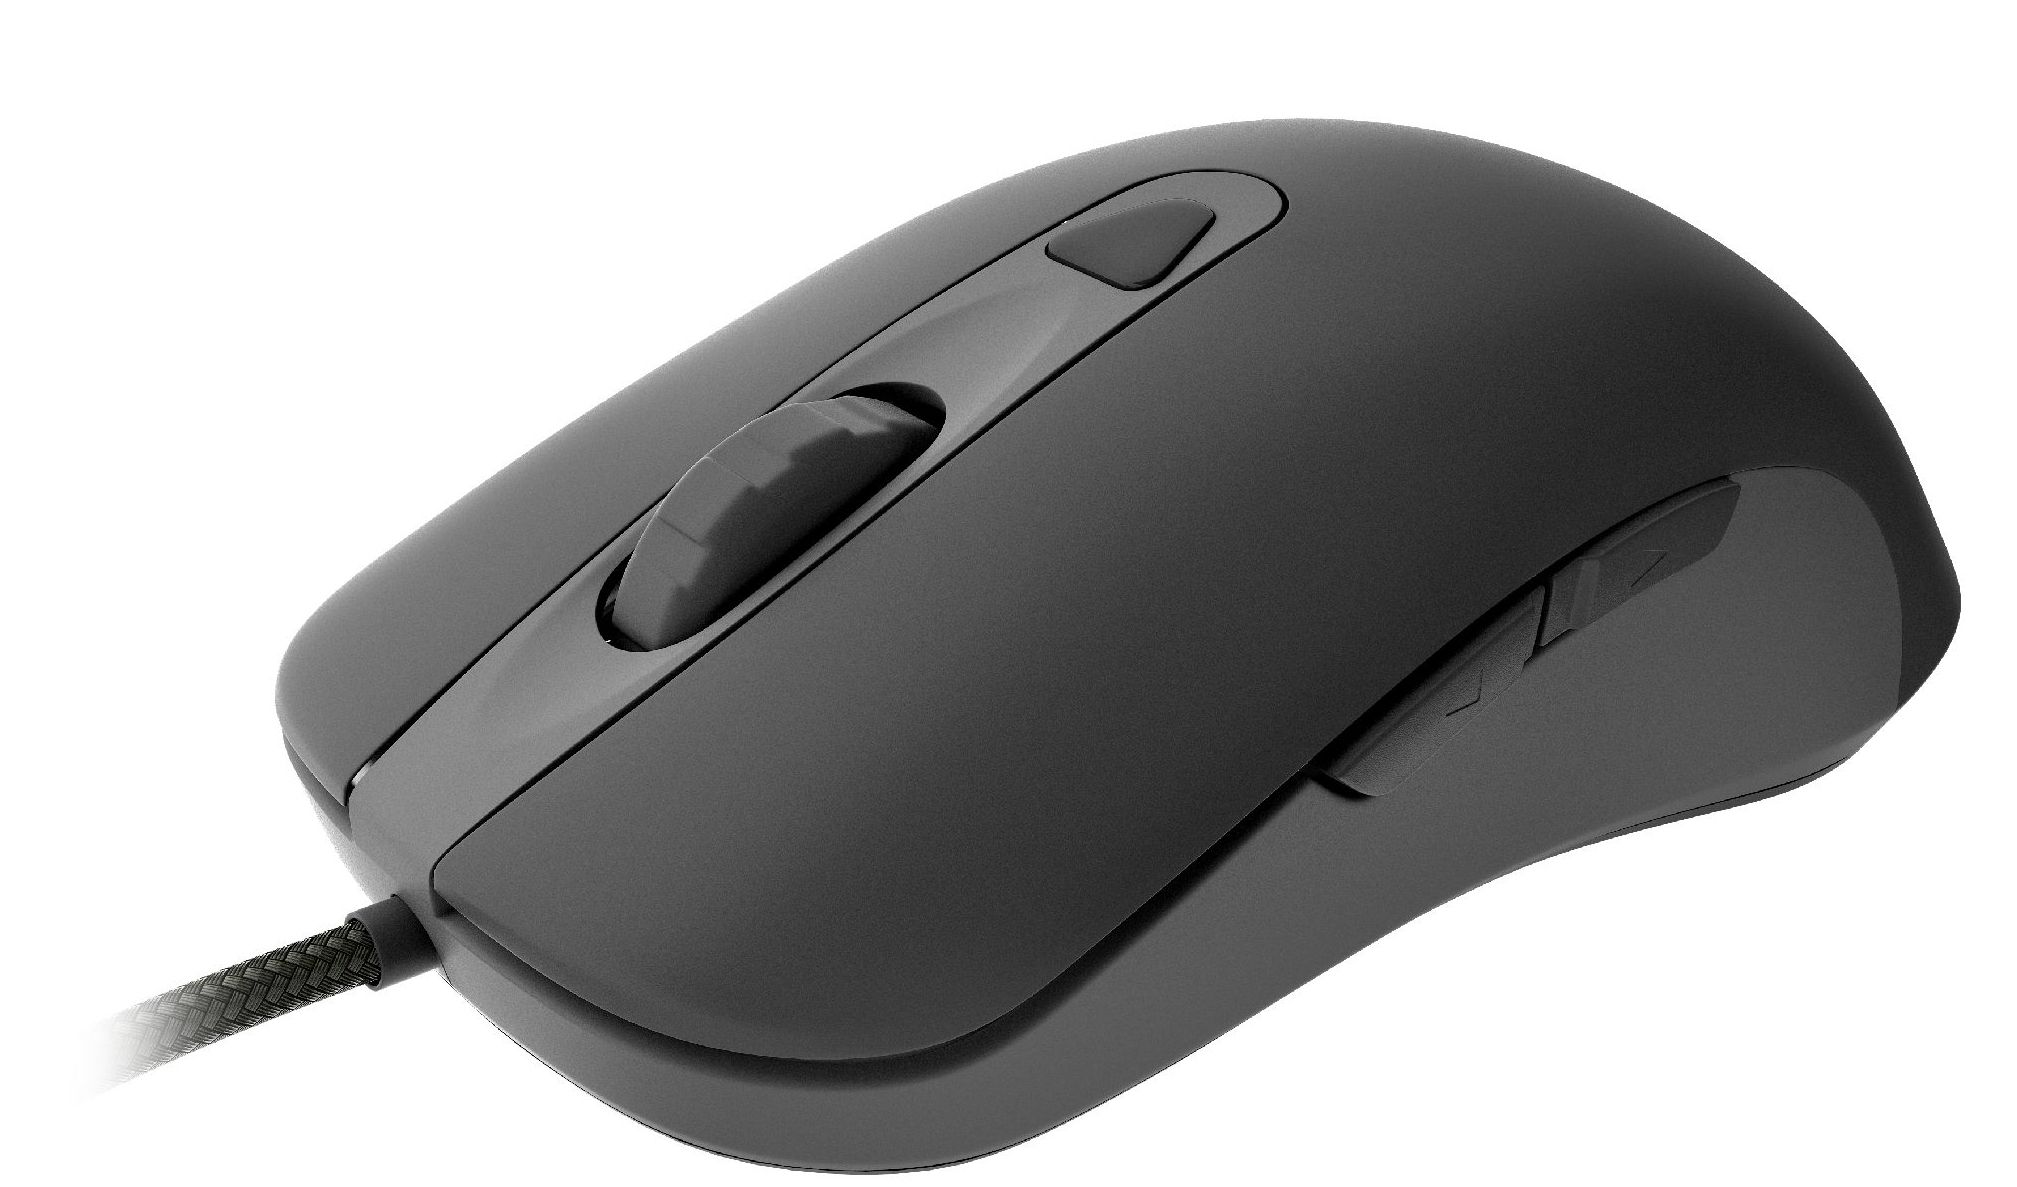 Гейминг мишка Genesis - Krypton 190, жична, оптична, черна - 4